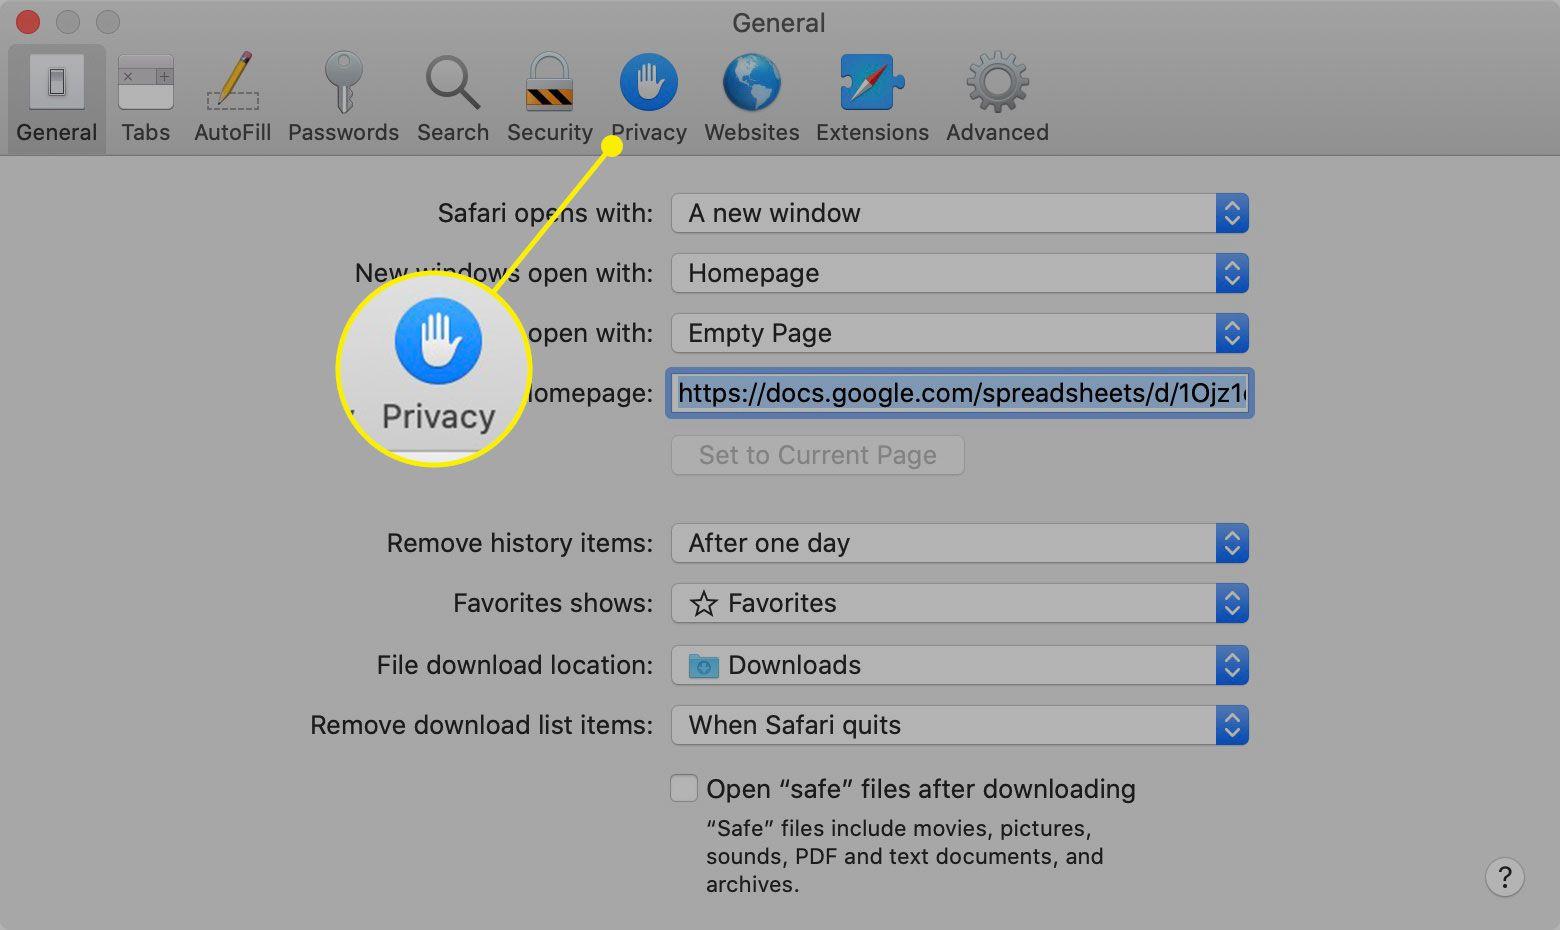 The Privacy tab in Safari preferences